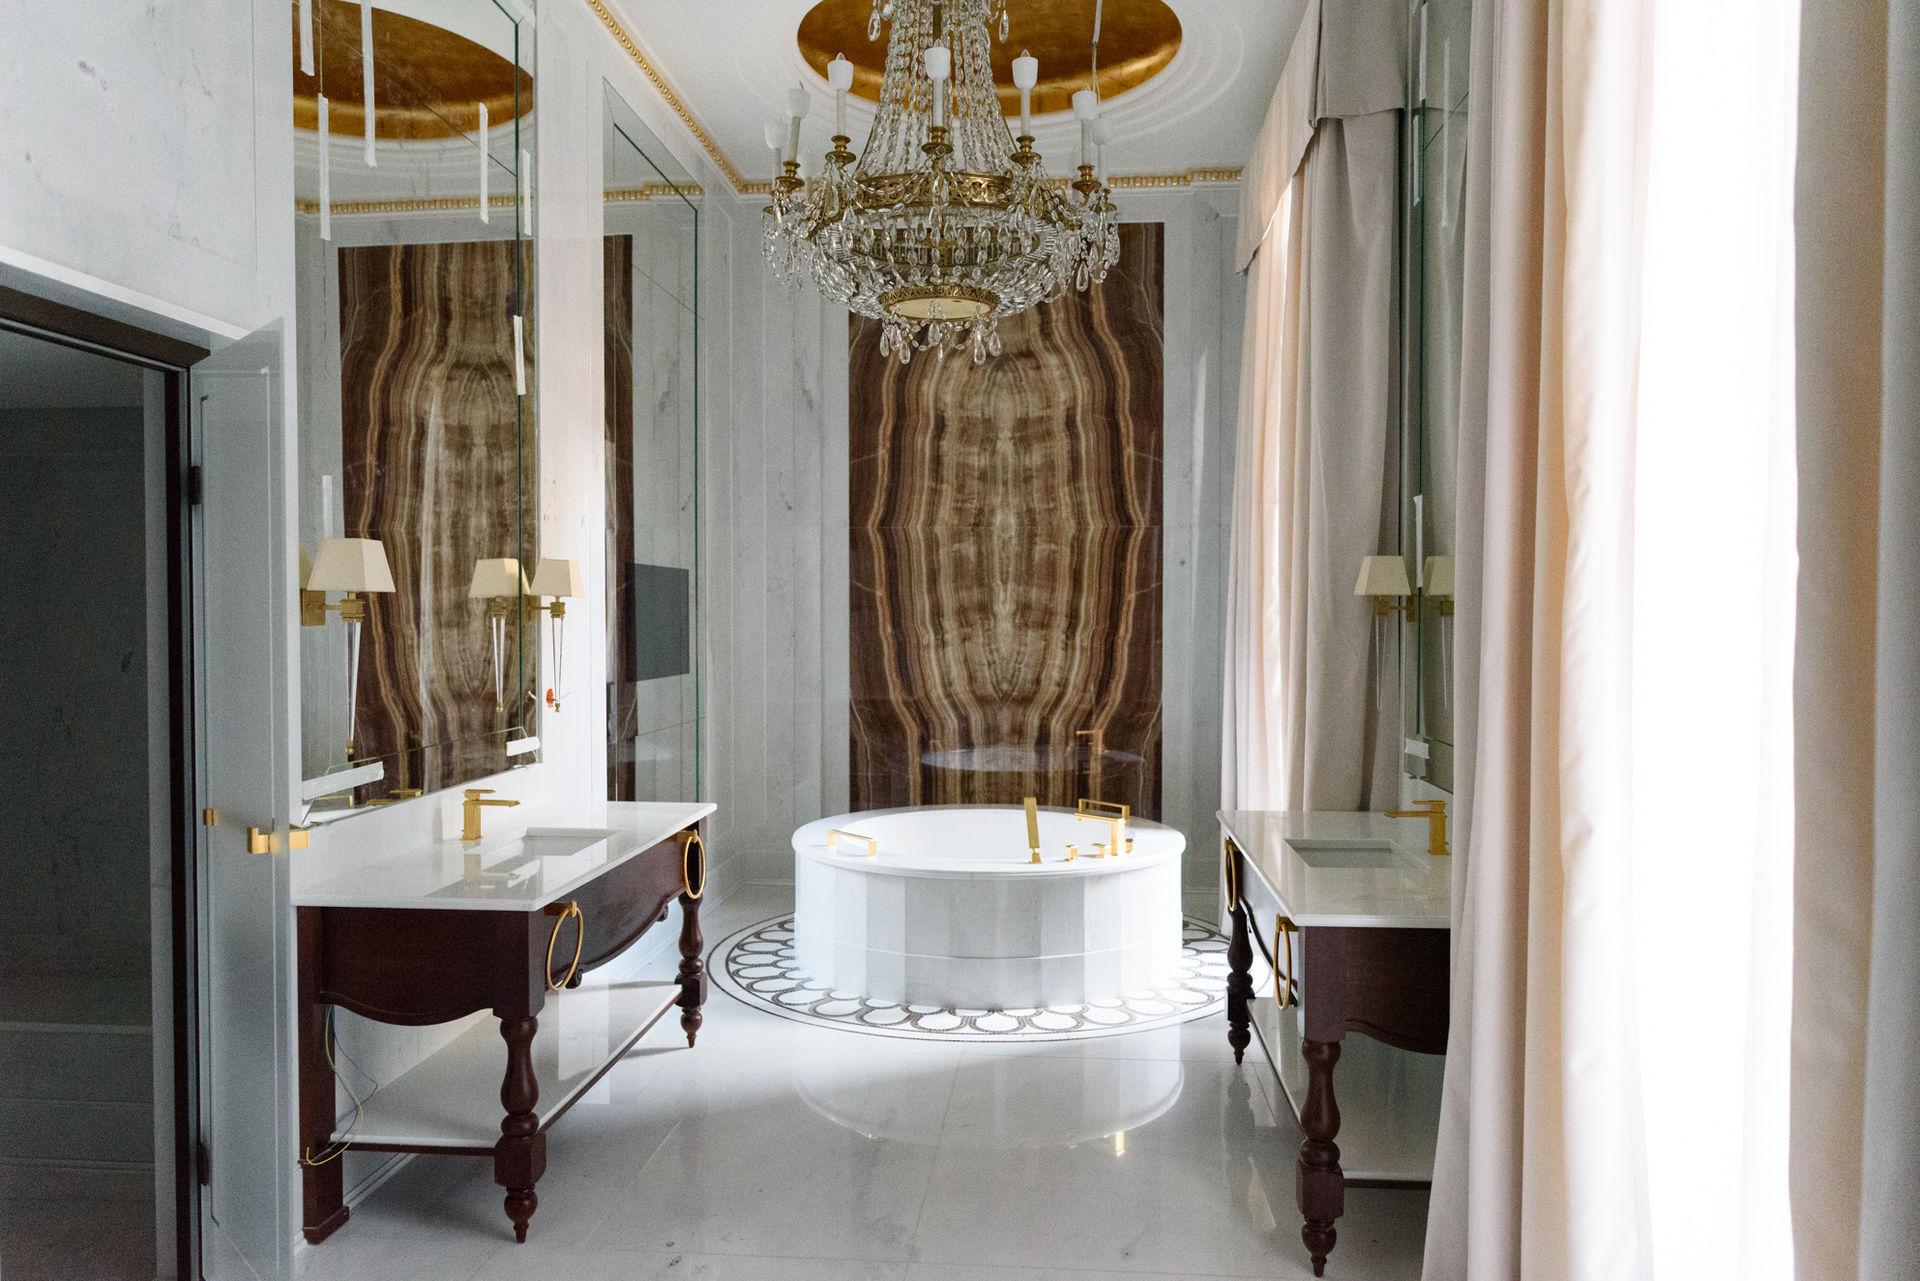 edificio-canalejas-four-seasons-hotel-madrid-00013.jpg